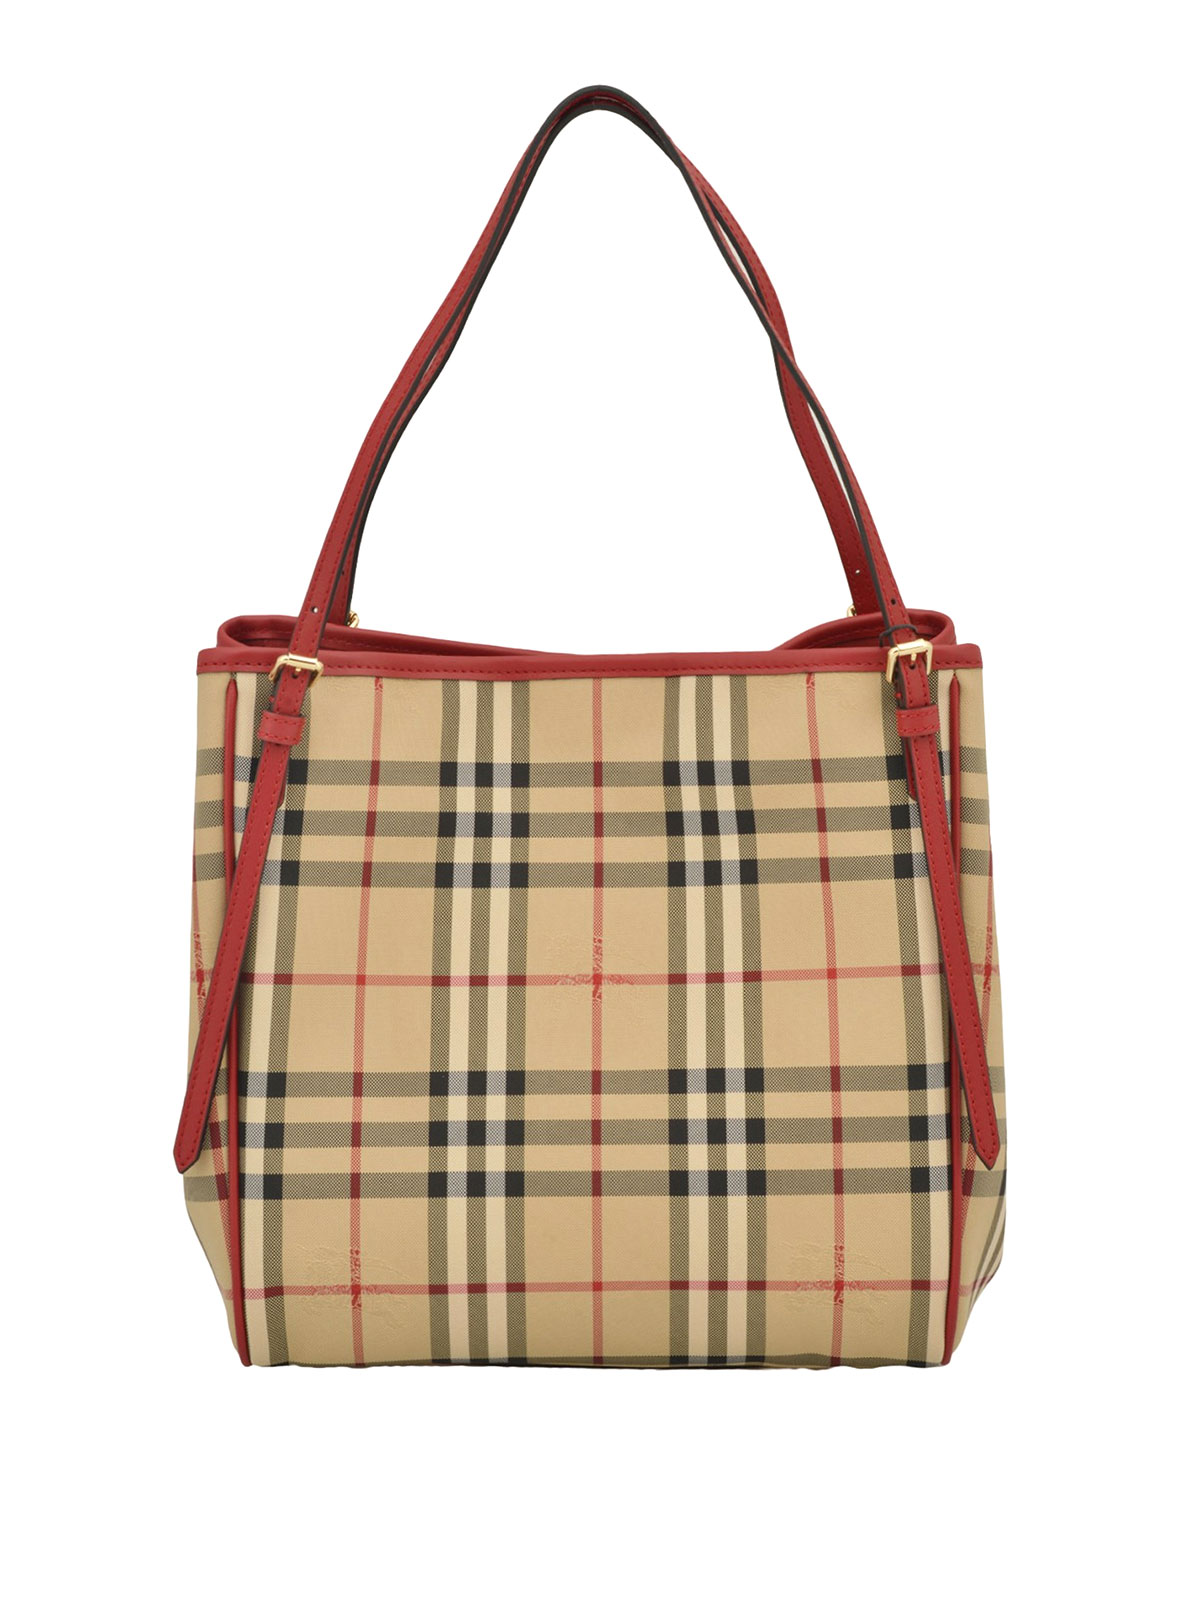 Burberry online shopping